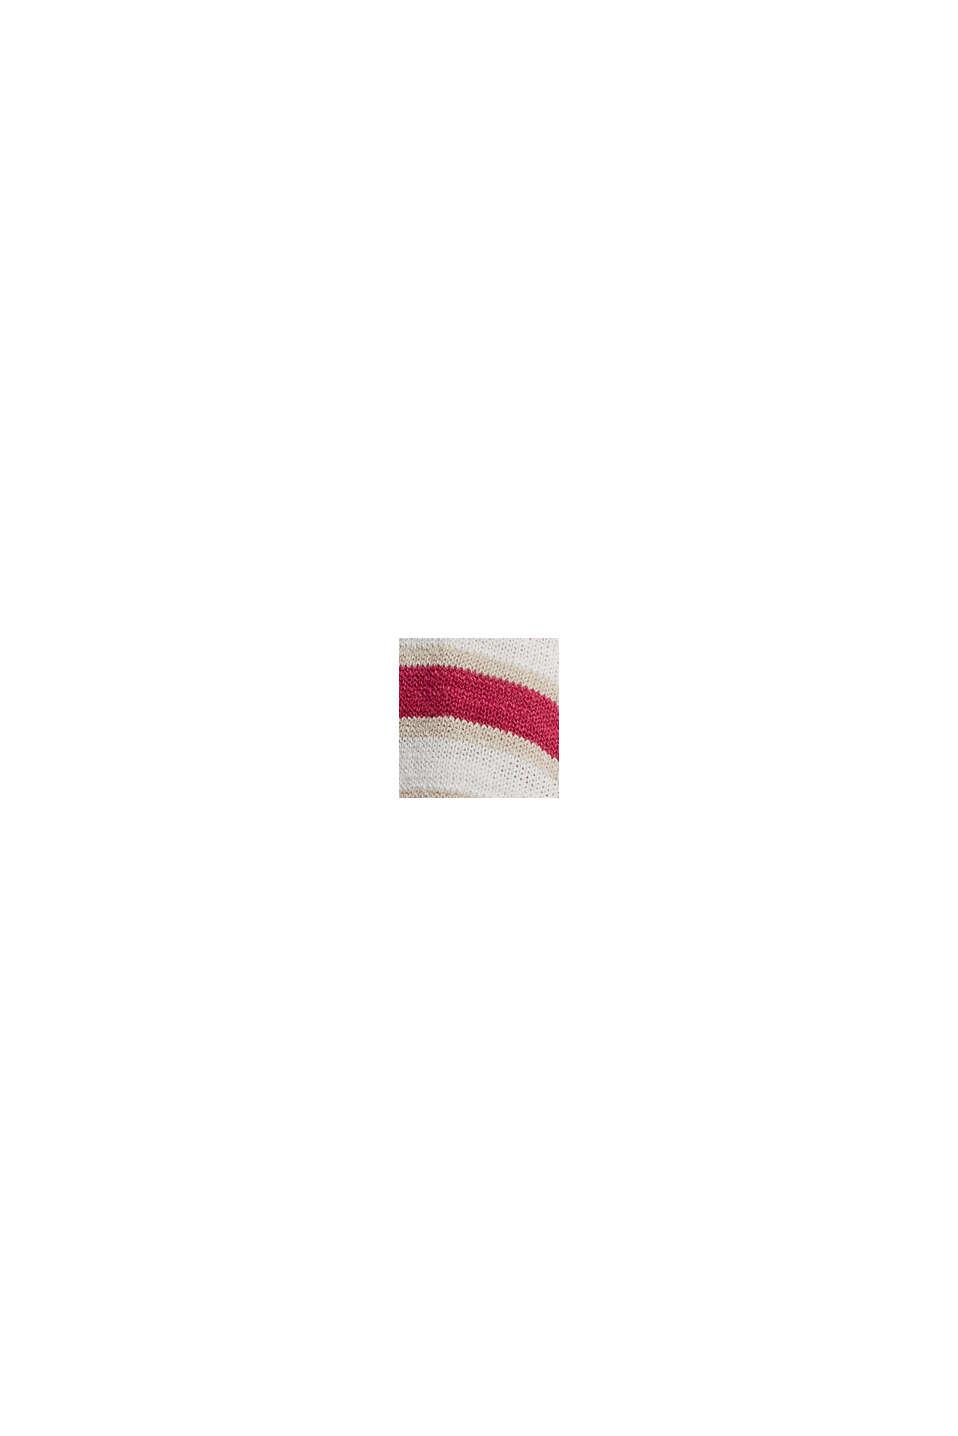 Short-sleeved jumper made of organic cotton/linen, DARK PINK, swatch